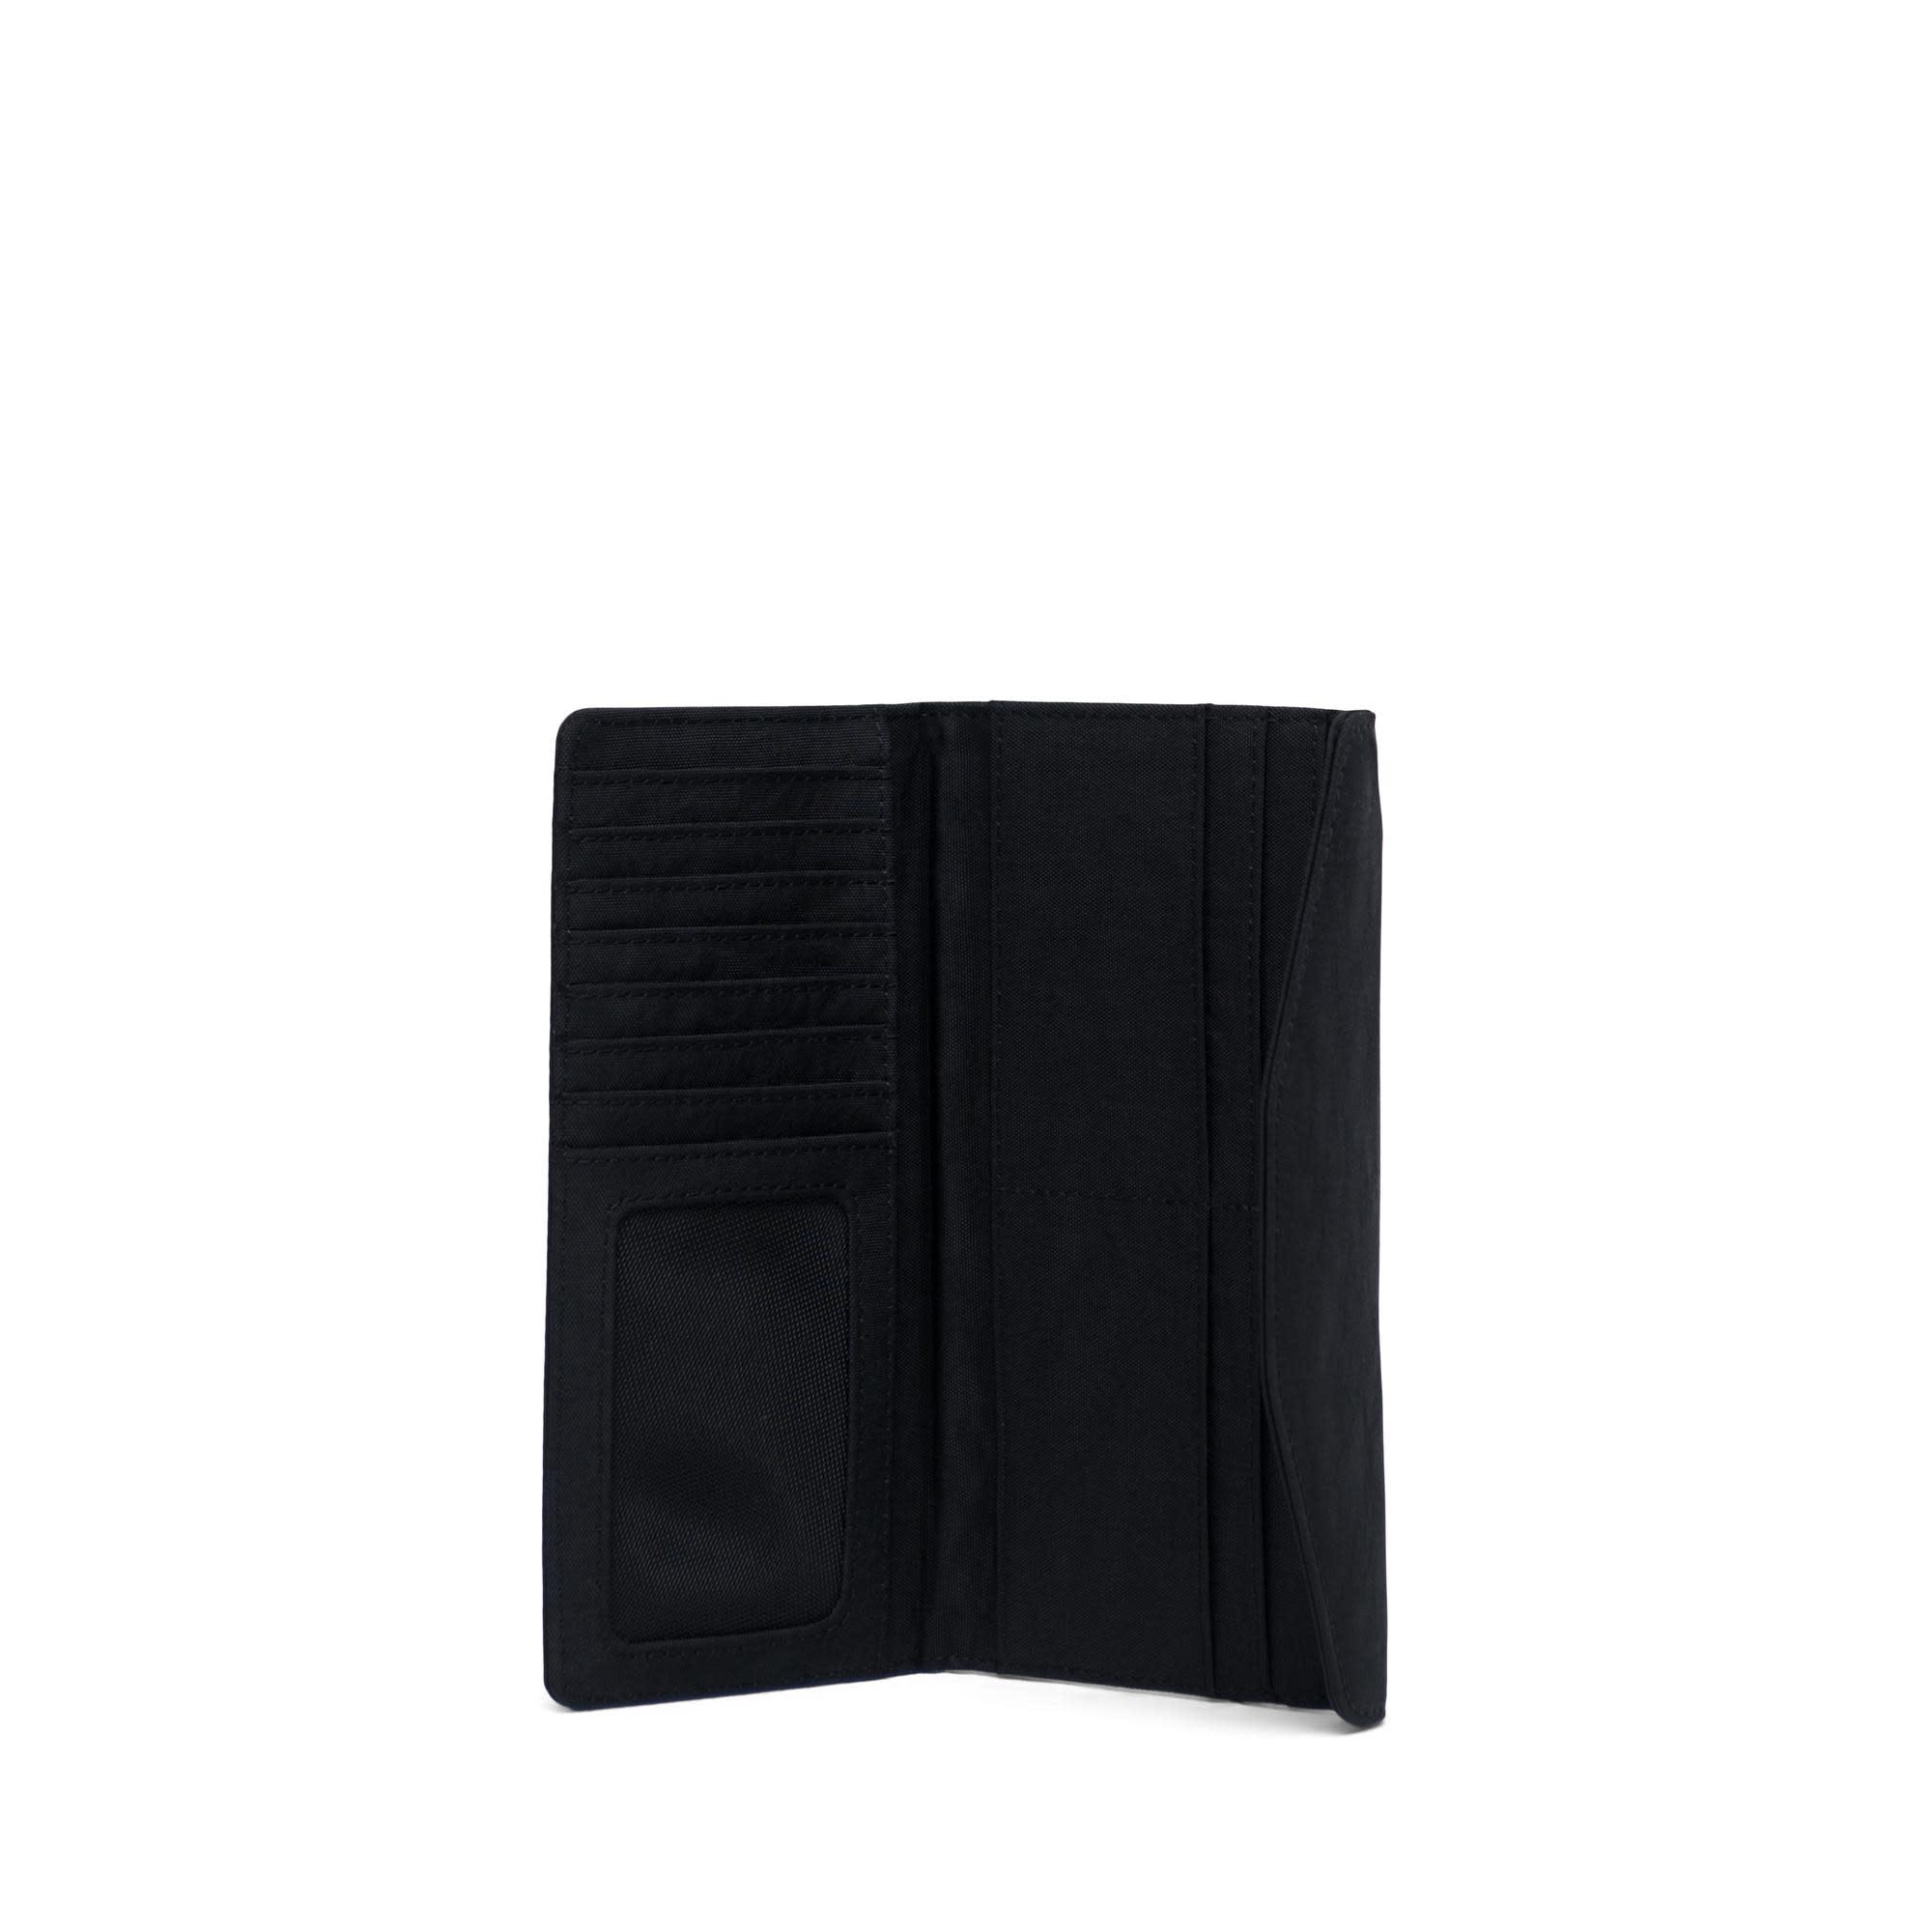 Herschel Supply Co. Herschel Orion Wallet - Large - Nylon/Leather Black